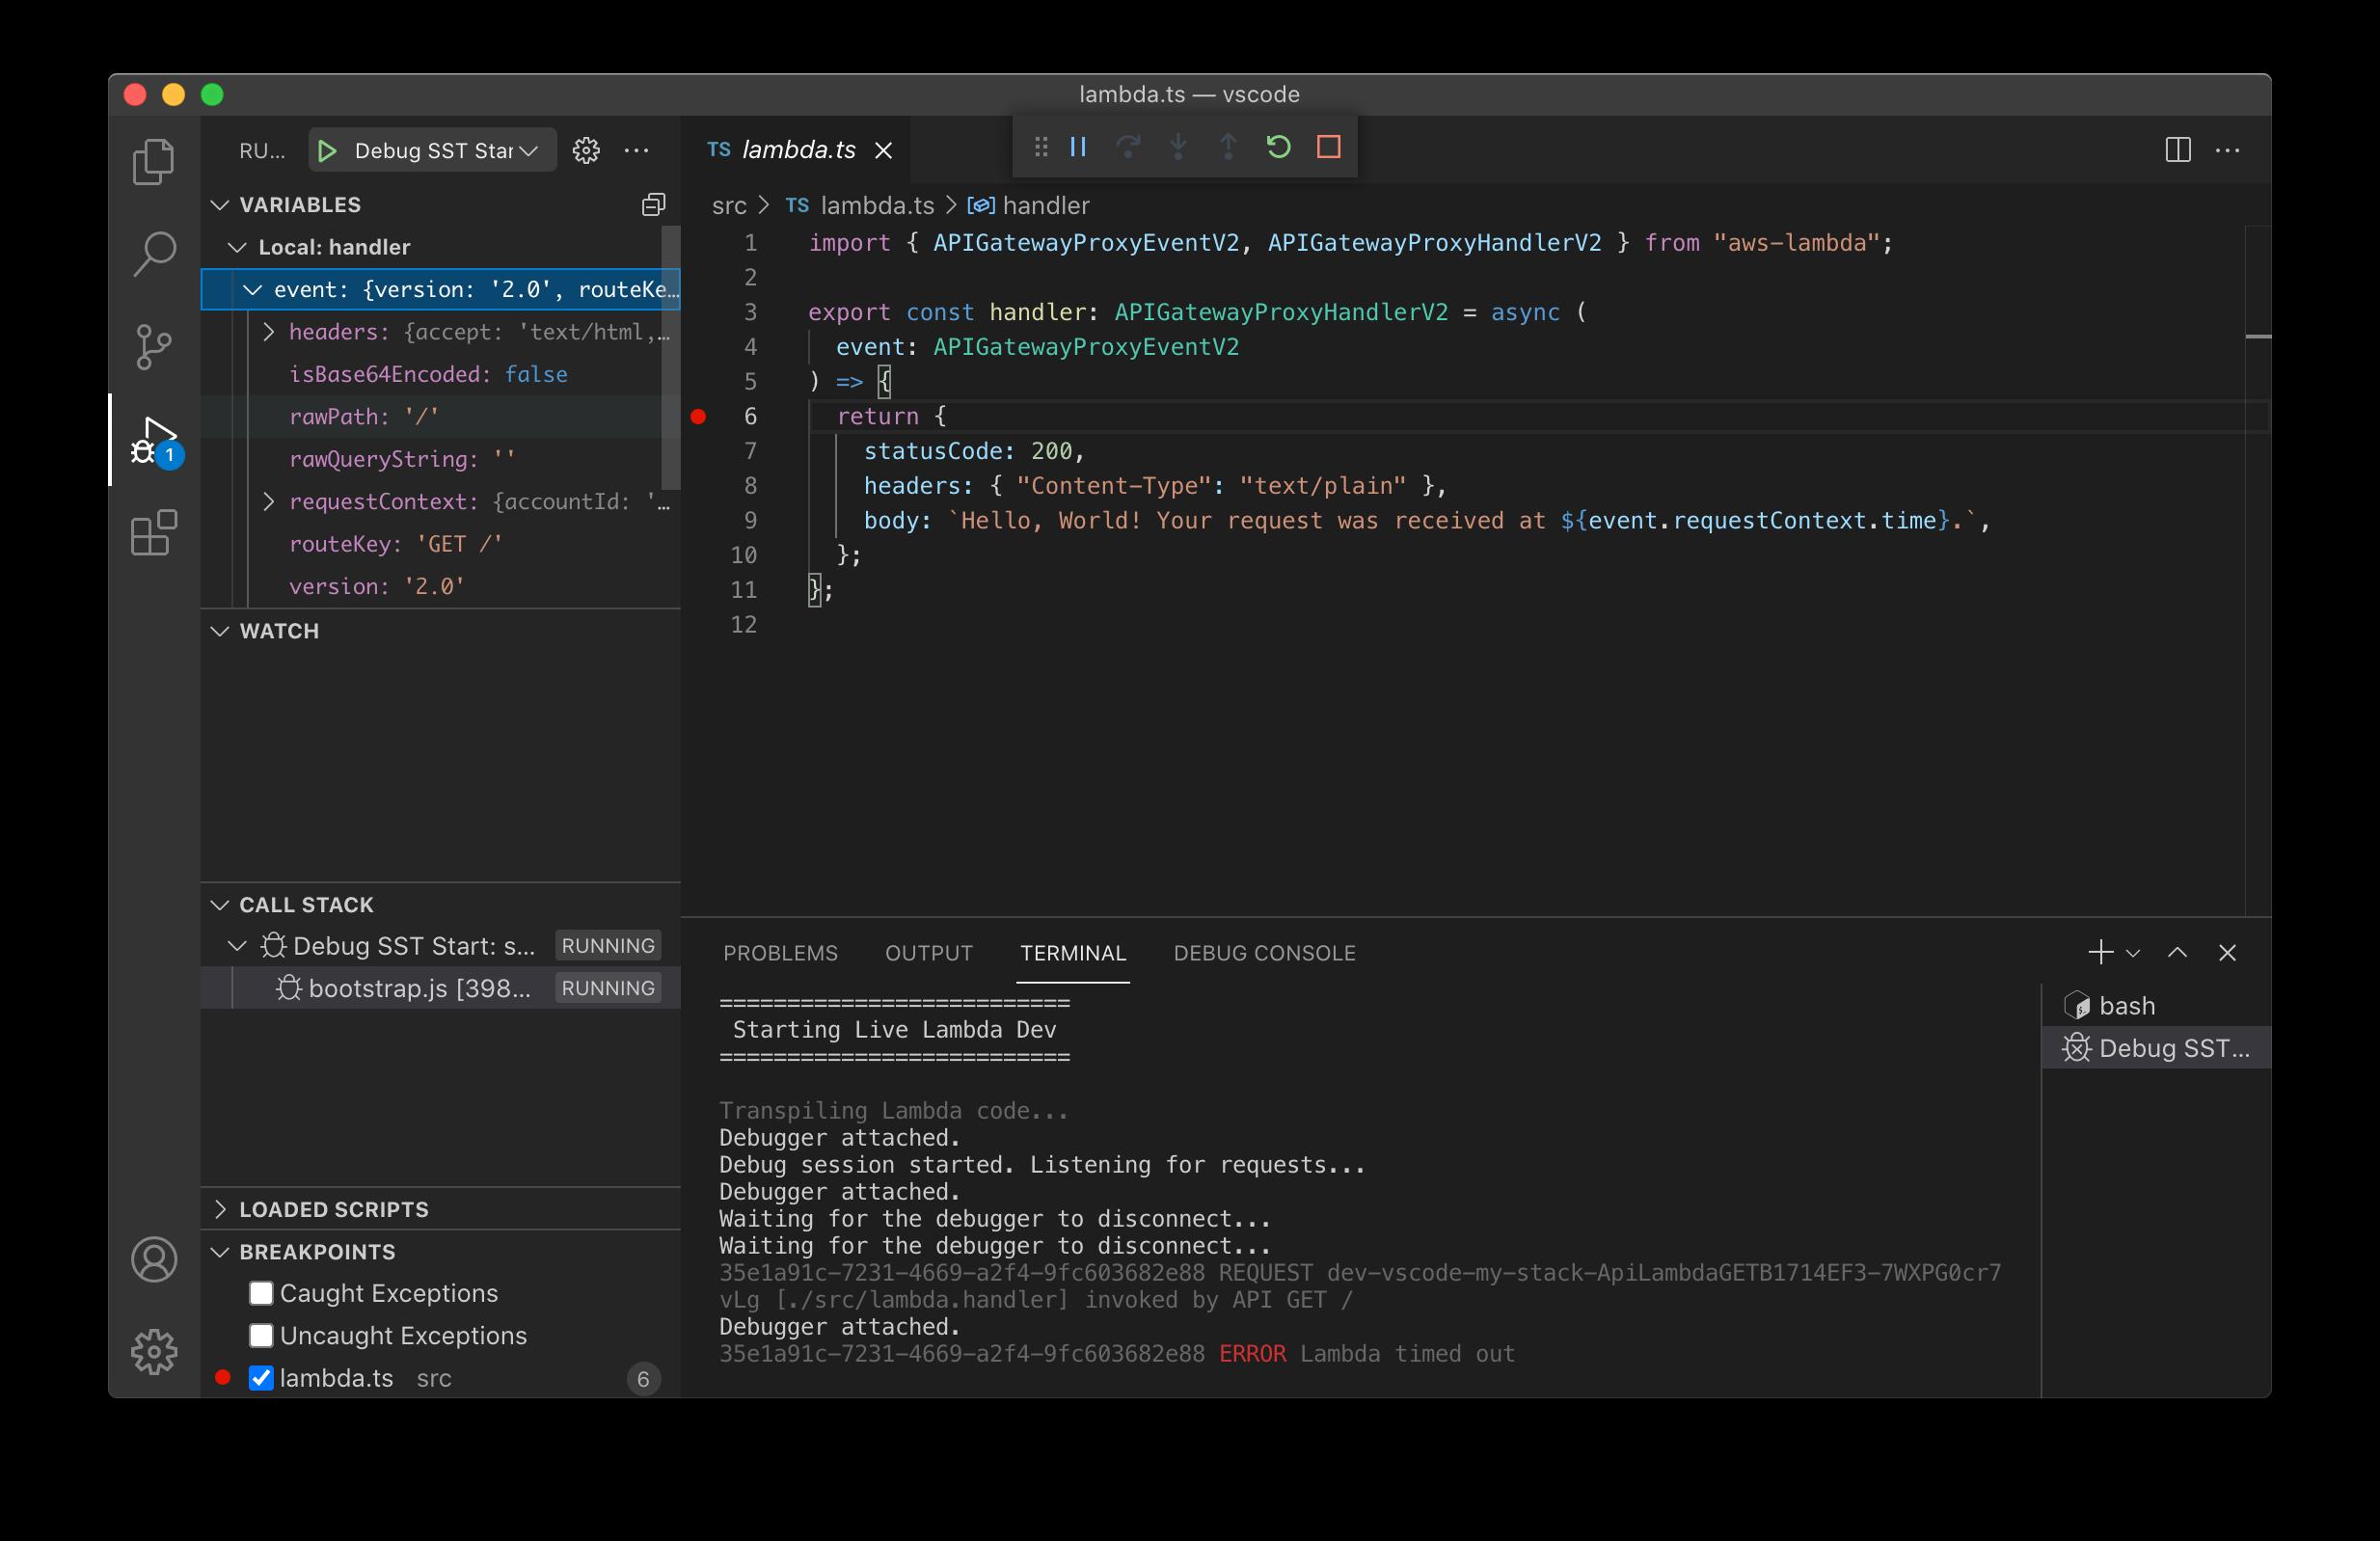 Hitting a breakpoint in a Lambda function in VS Code